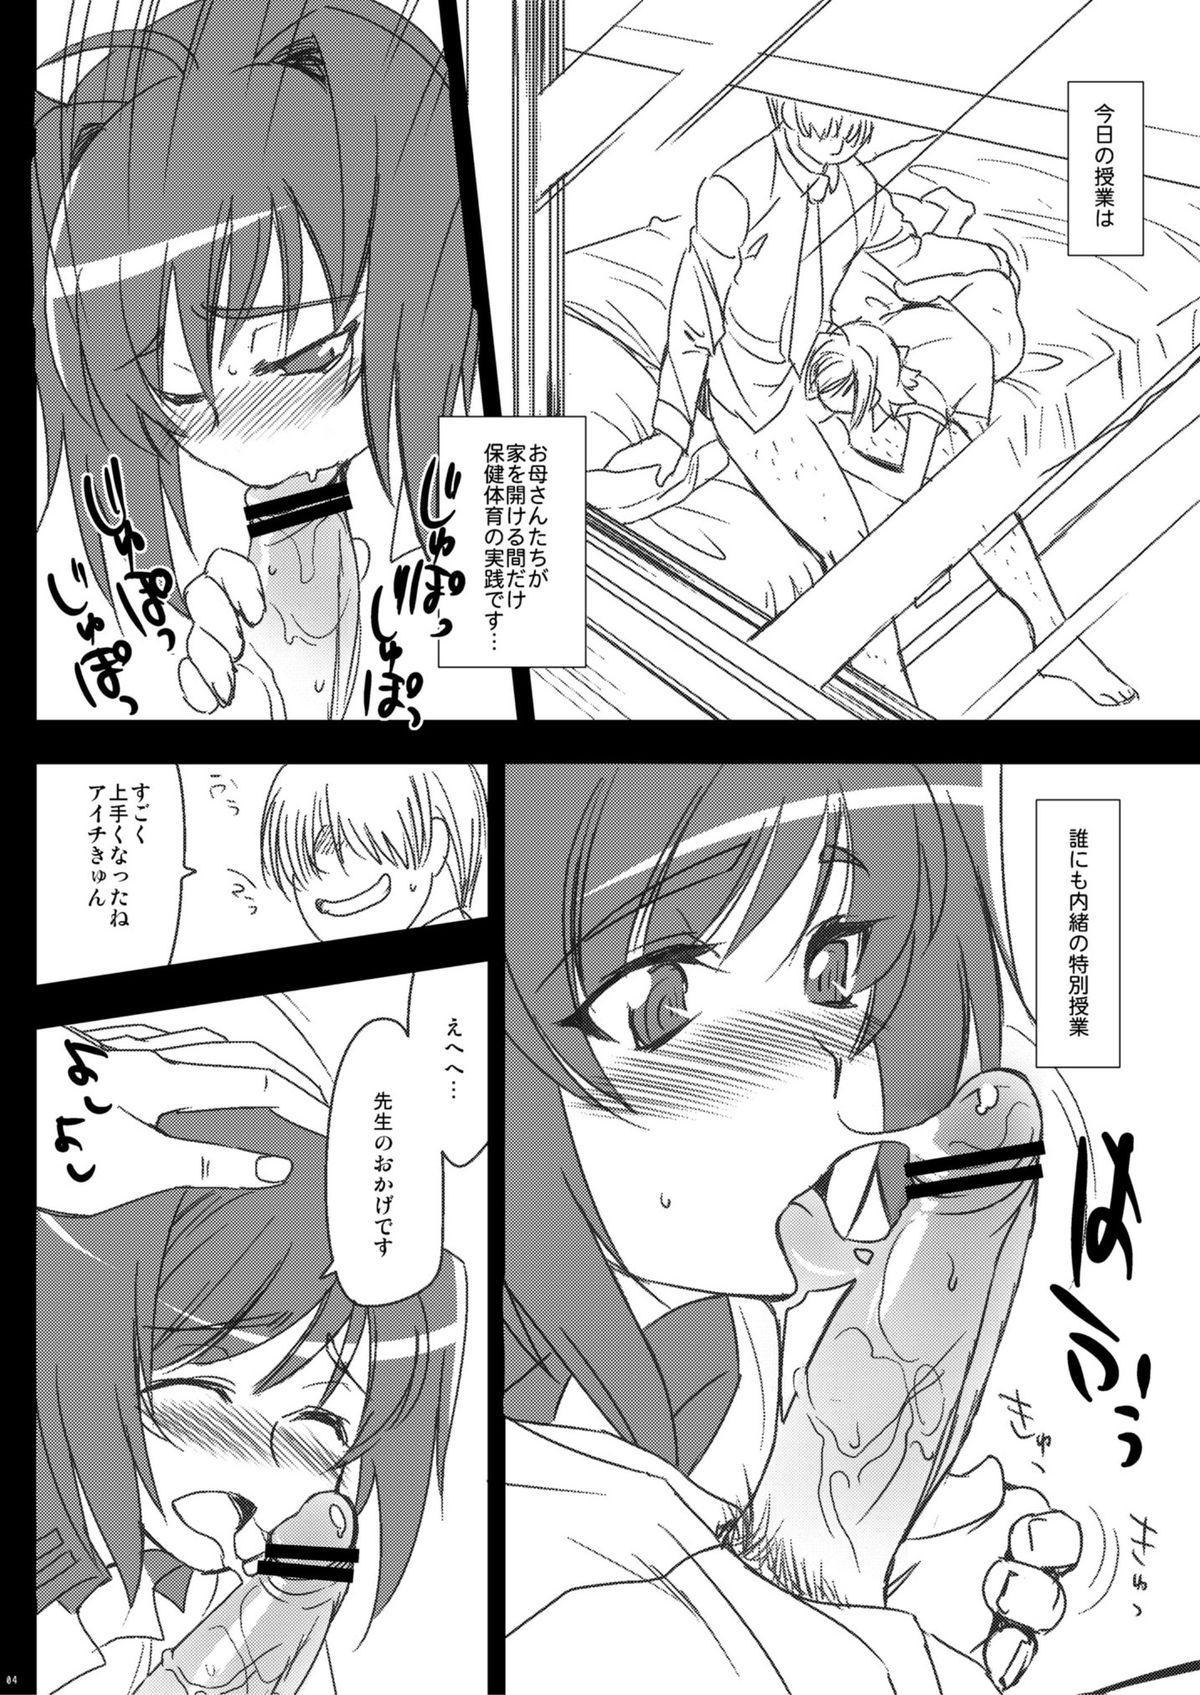 Tachikawa Negoro(kitsune)Tutor ride! Attack in Aichi!(Cardfight!! Vanguard) 3